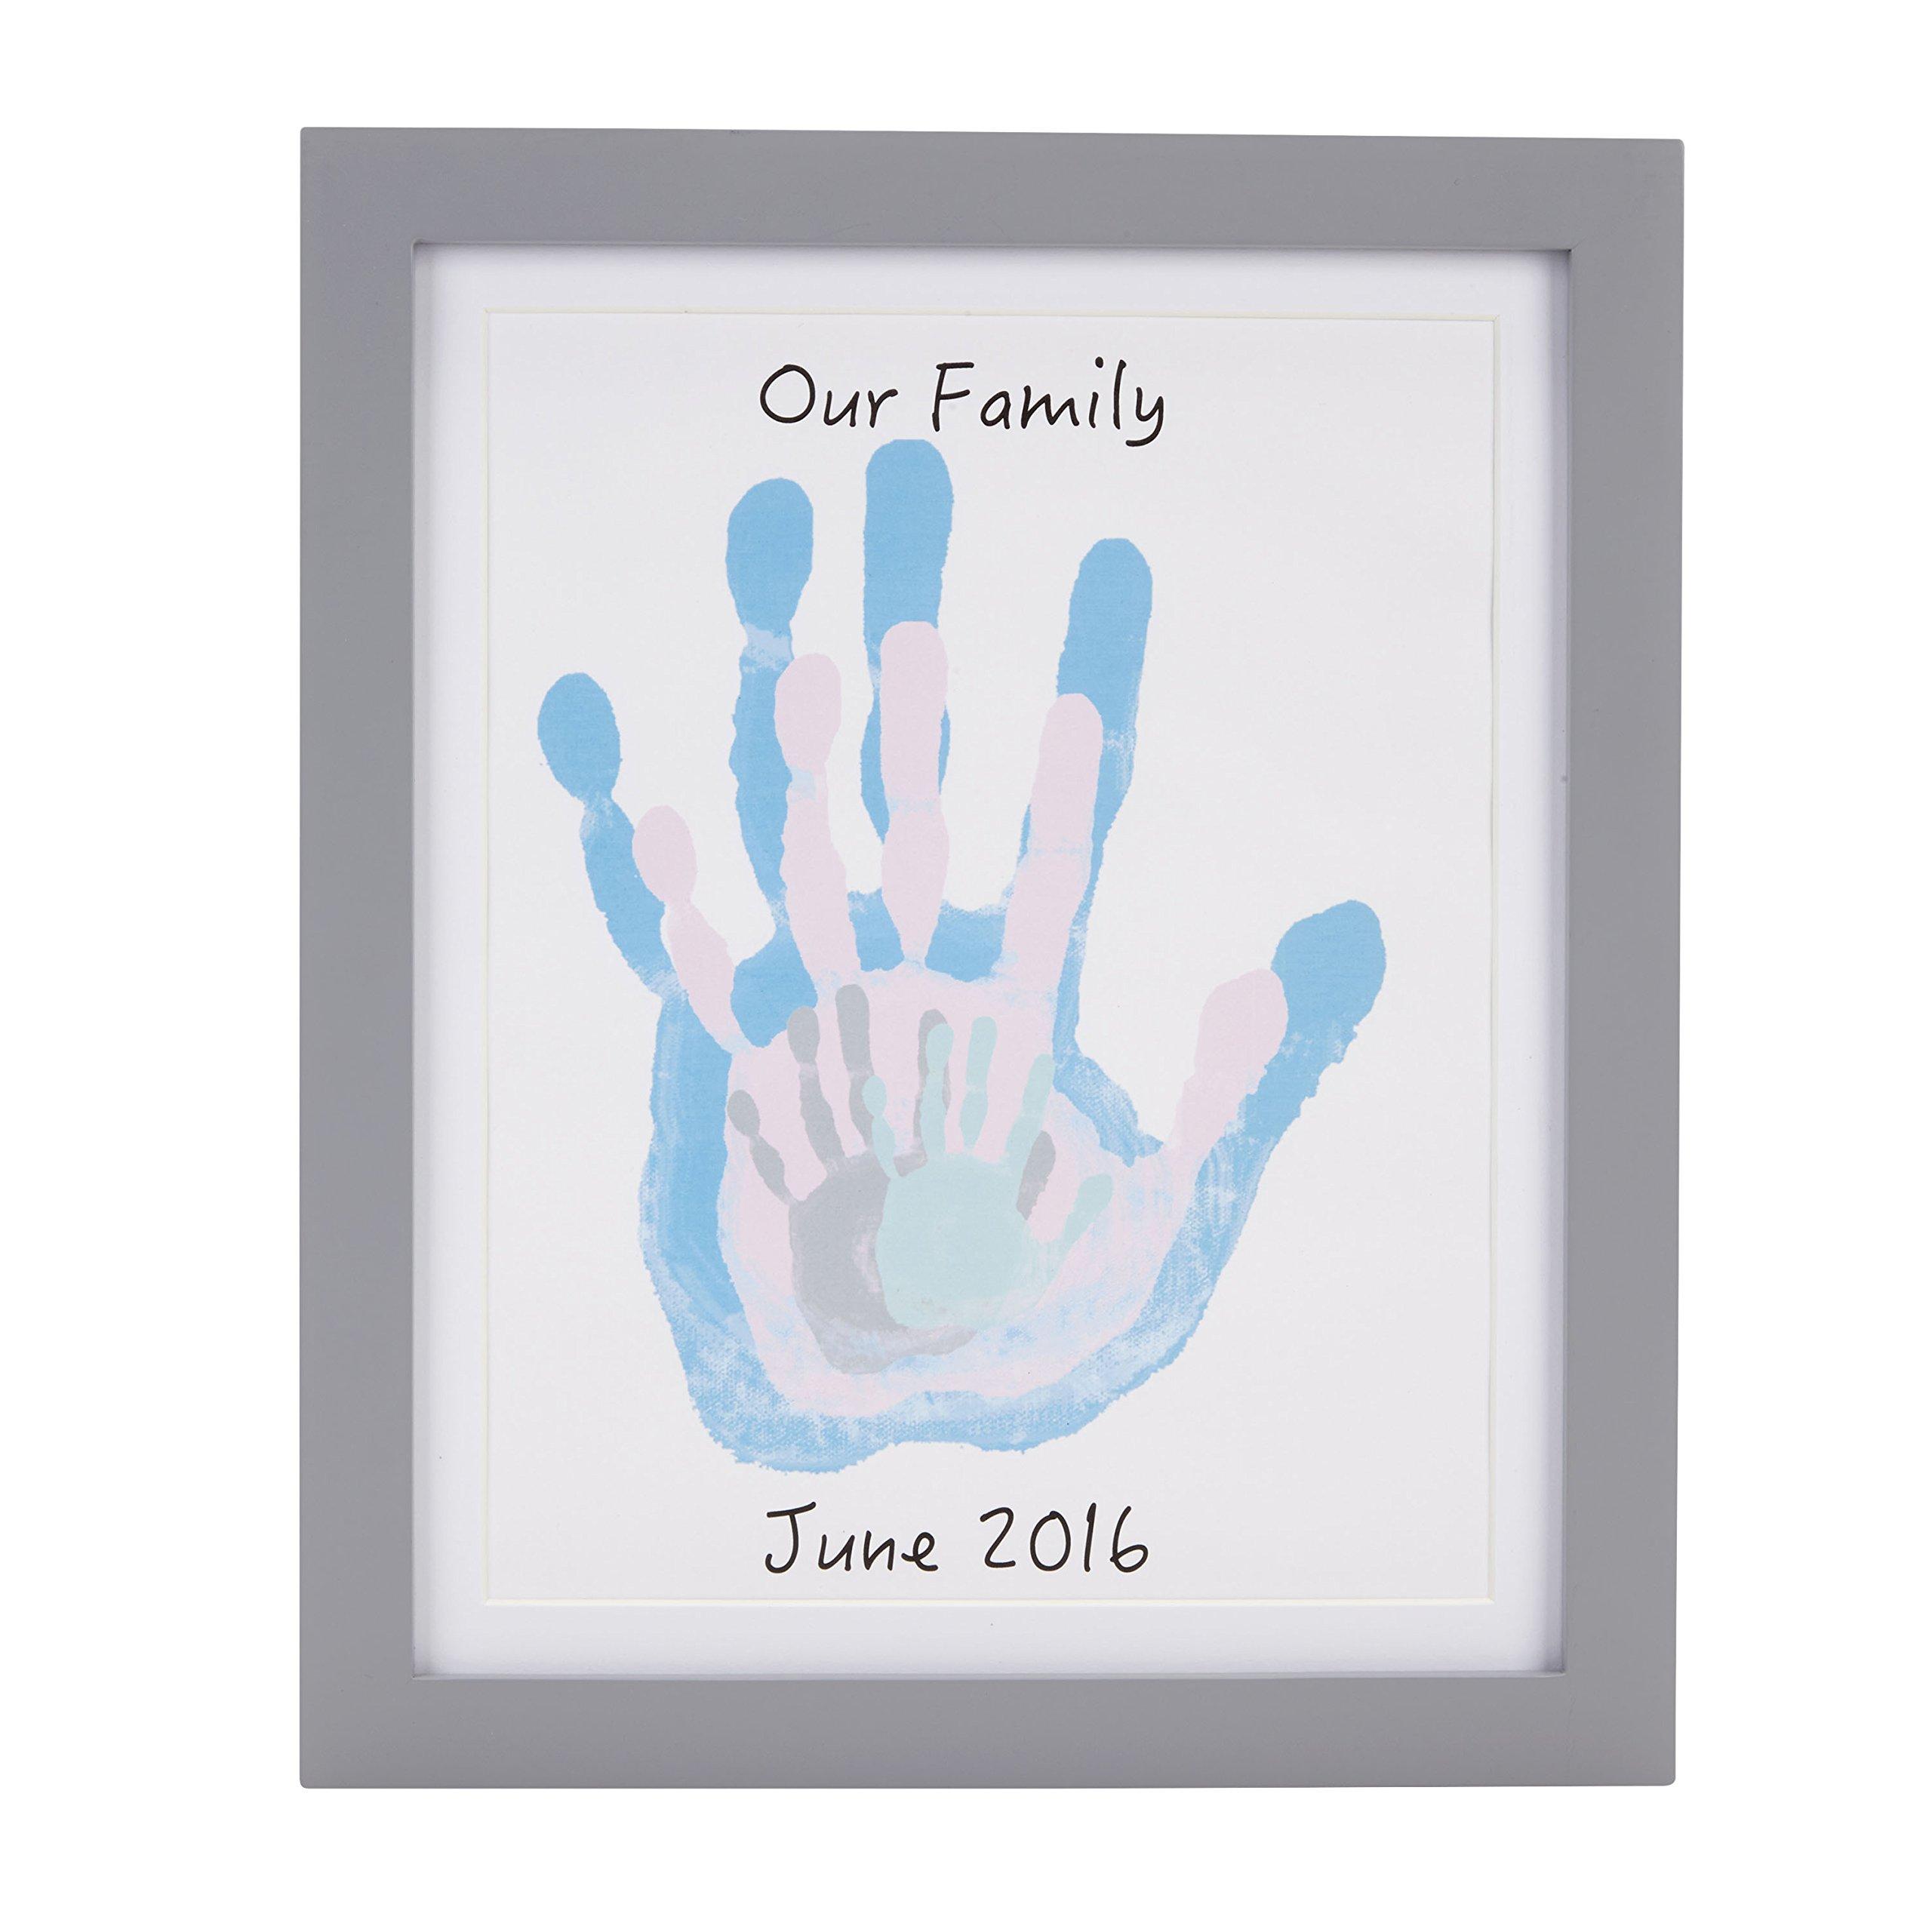 Pearhead DIY Family Handprint Frame and Paint Kit, Gray